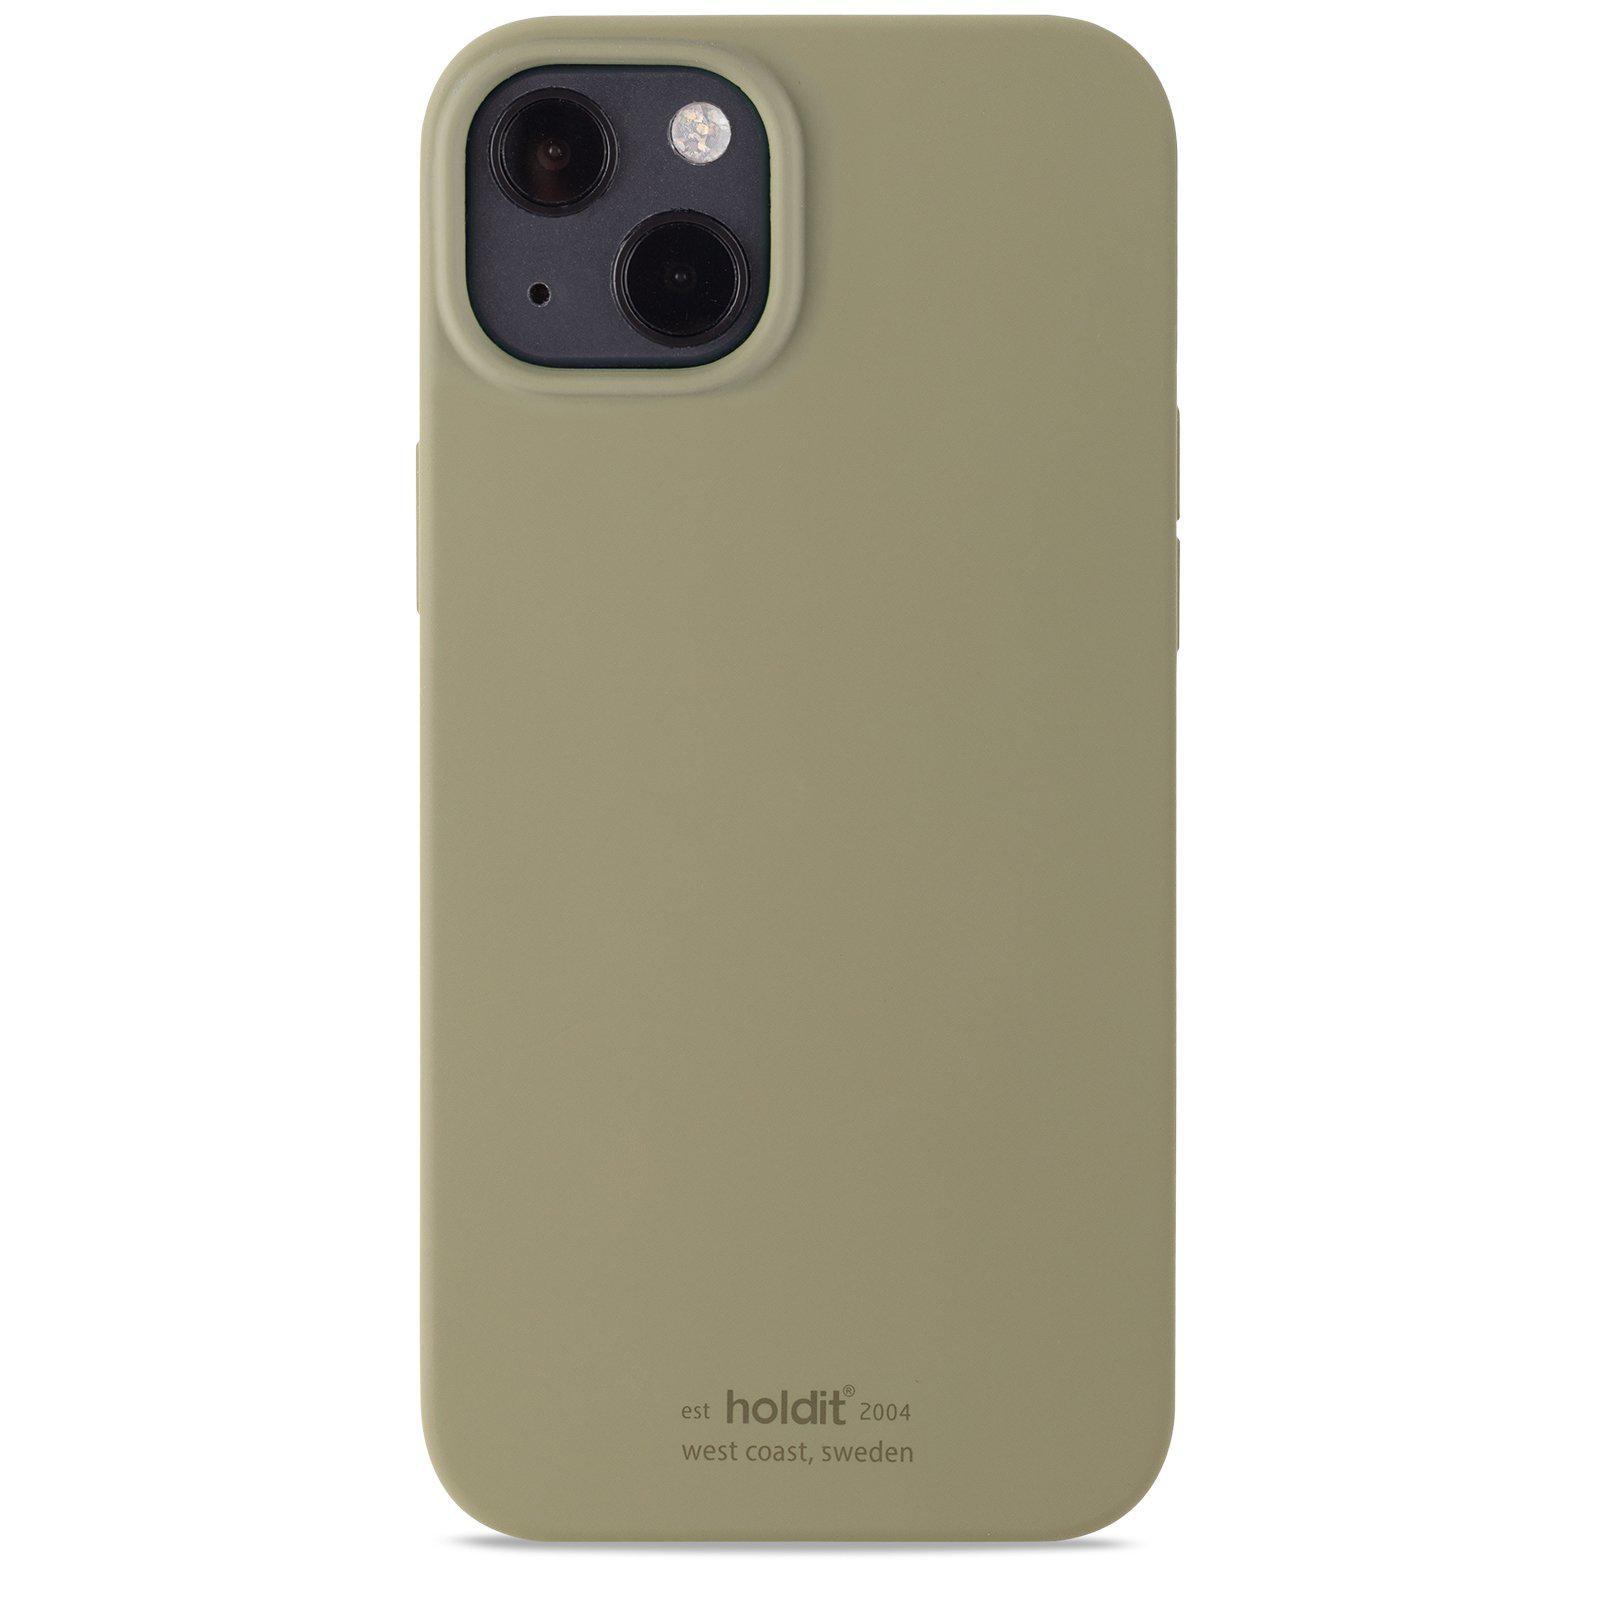 Silikonskal iPhone 13 Khaki Green